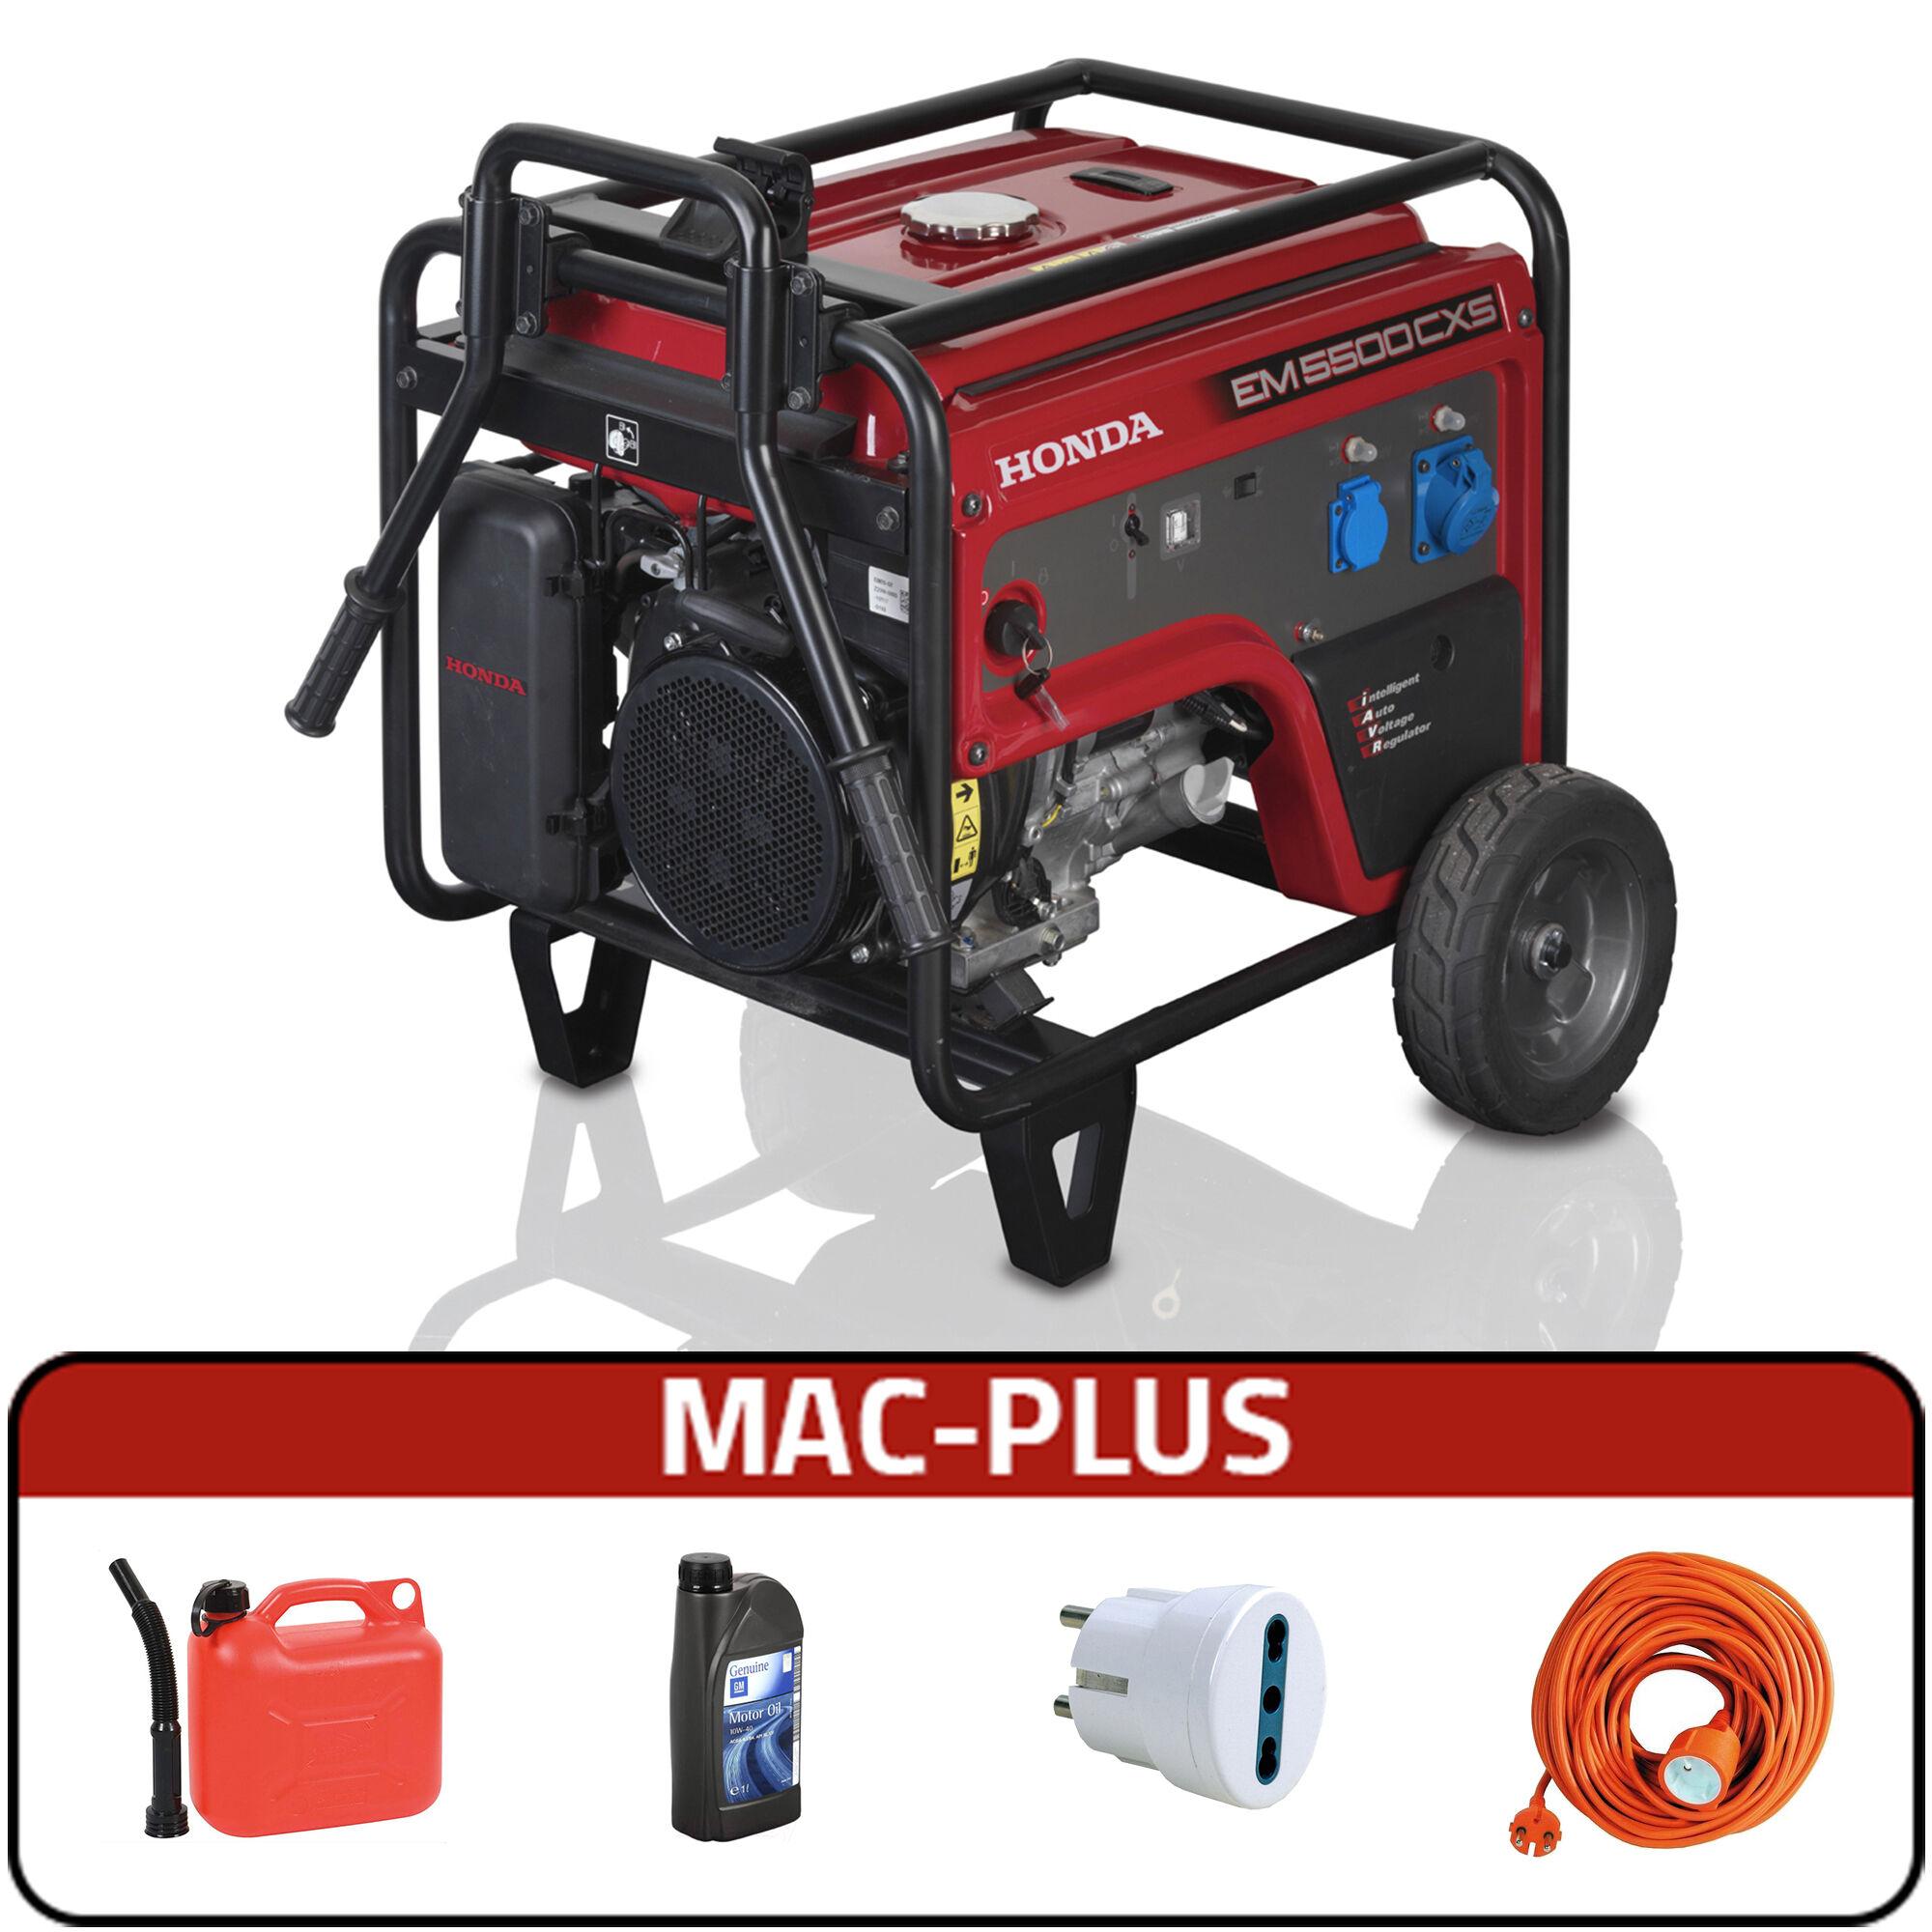 honda generatore di corrente honda em 5500cxs carrellato + mac plus